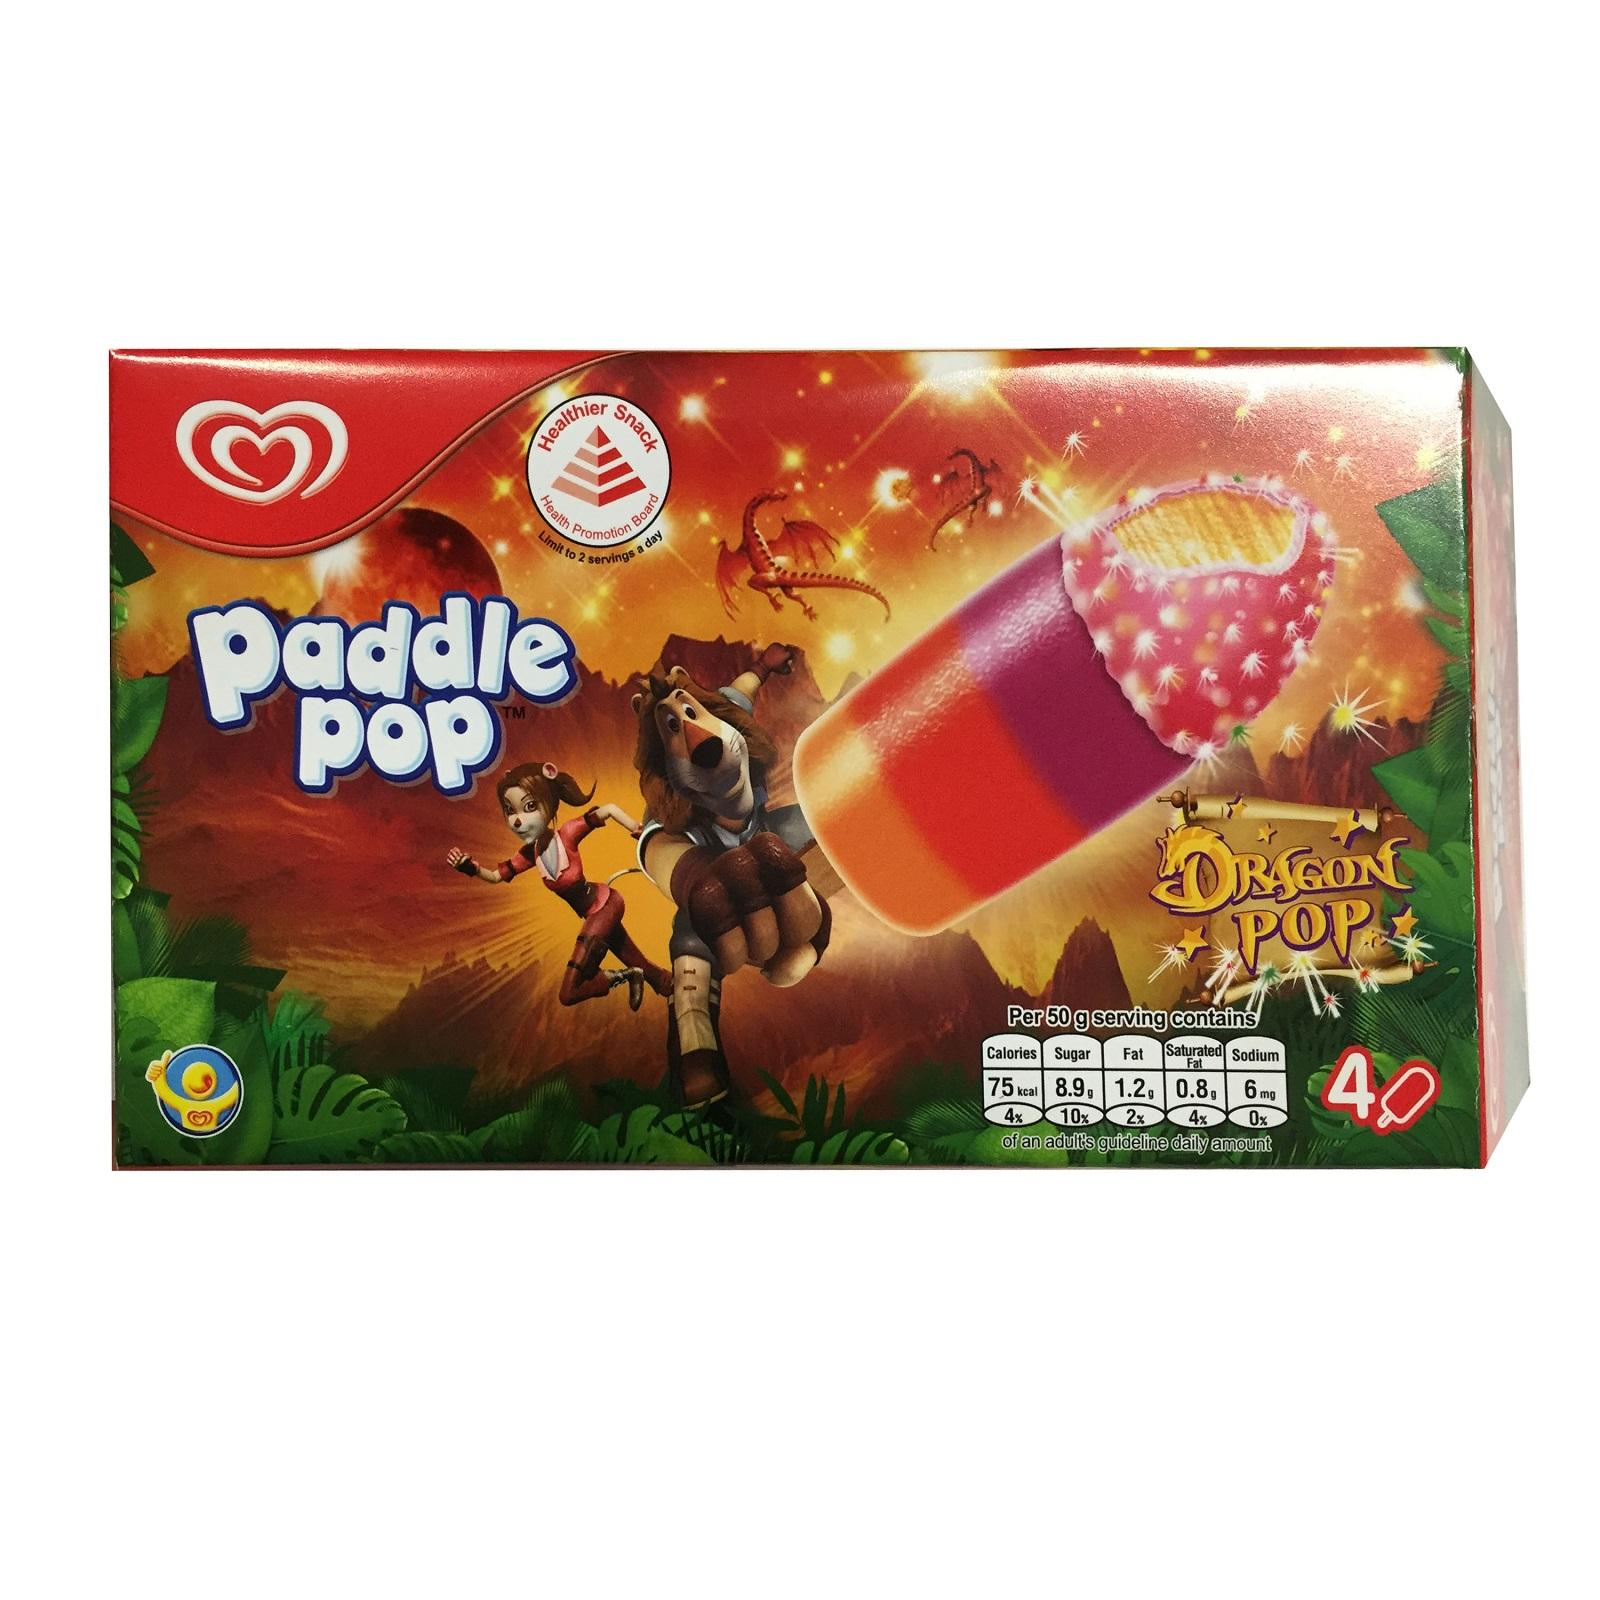 Paddle Pop Dragon Pop Multipack Ice Cream (4 sticks)